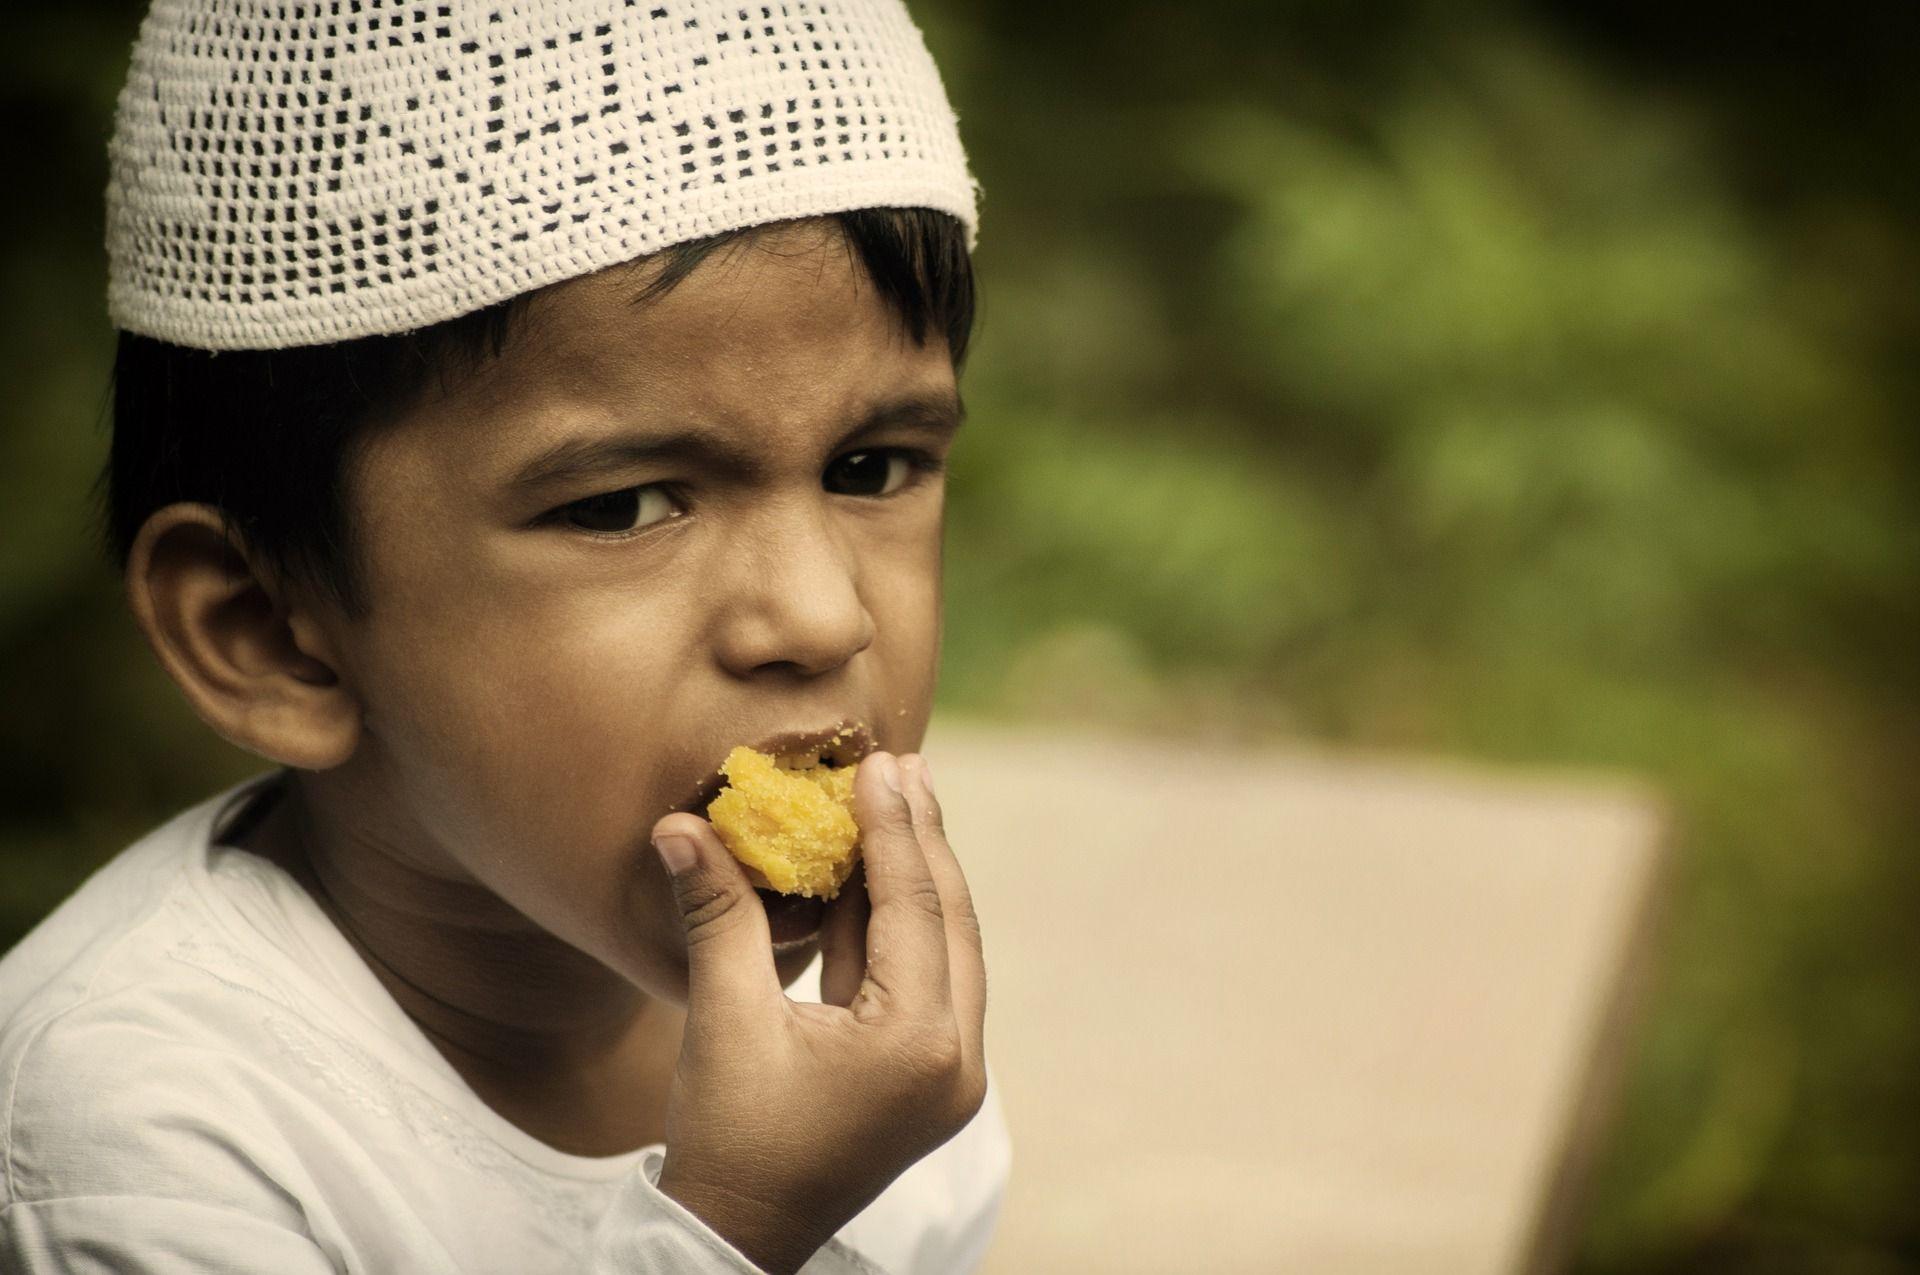 Jeune garçon qui mange